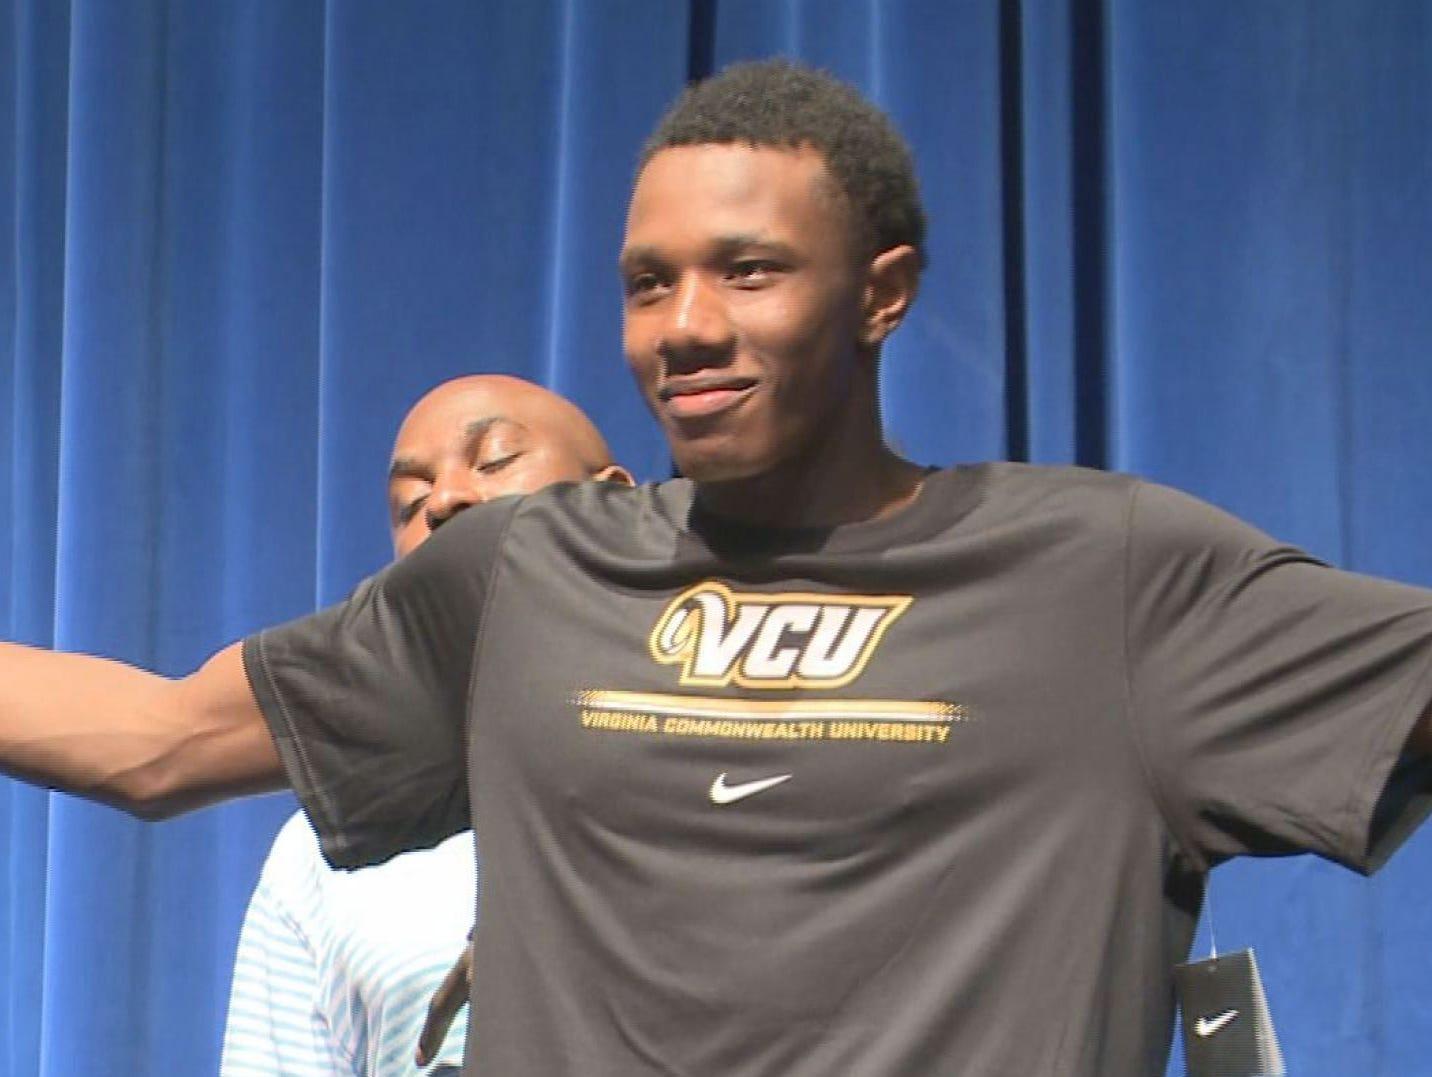 In November, Dreher's Tevin Mack announced he would be attending VCU.